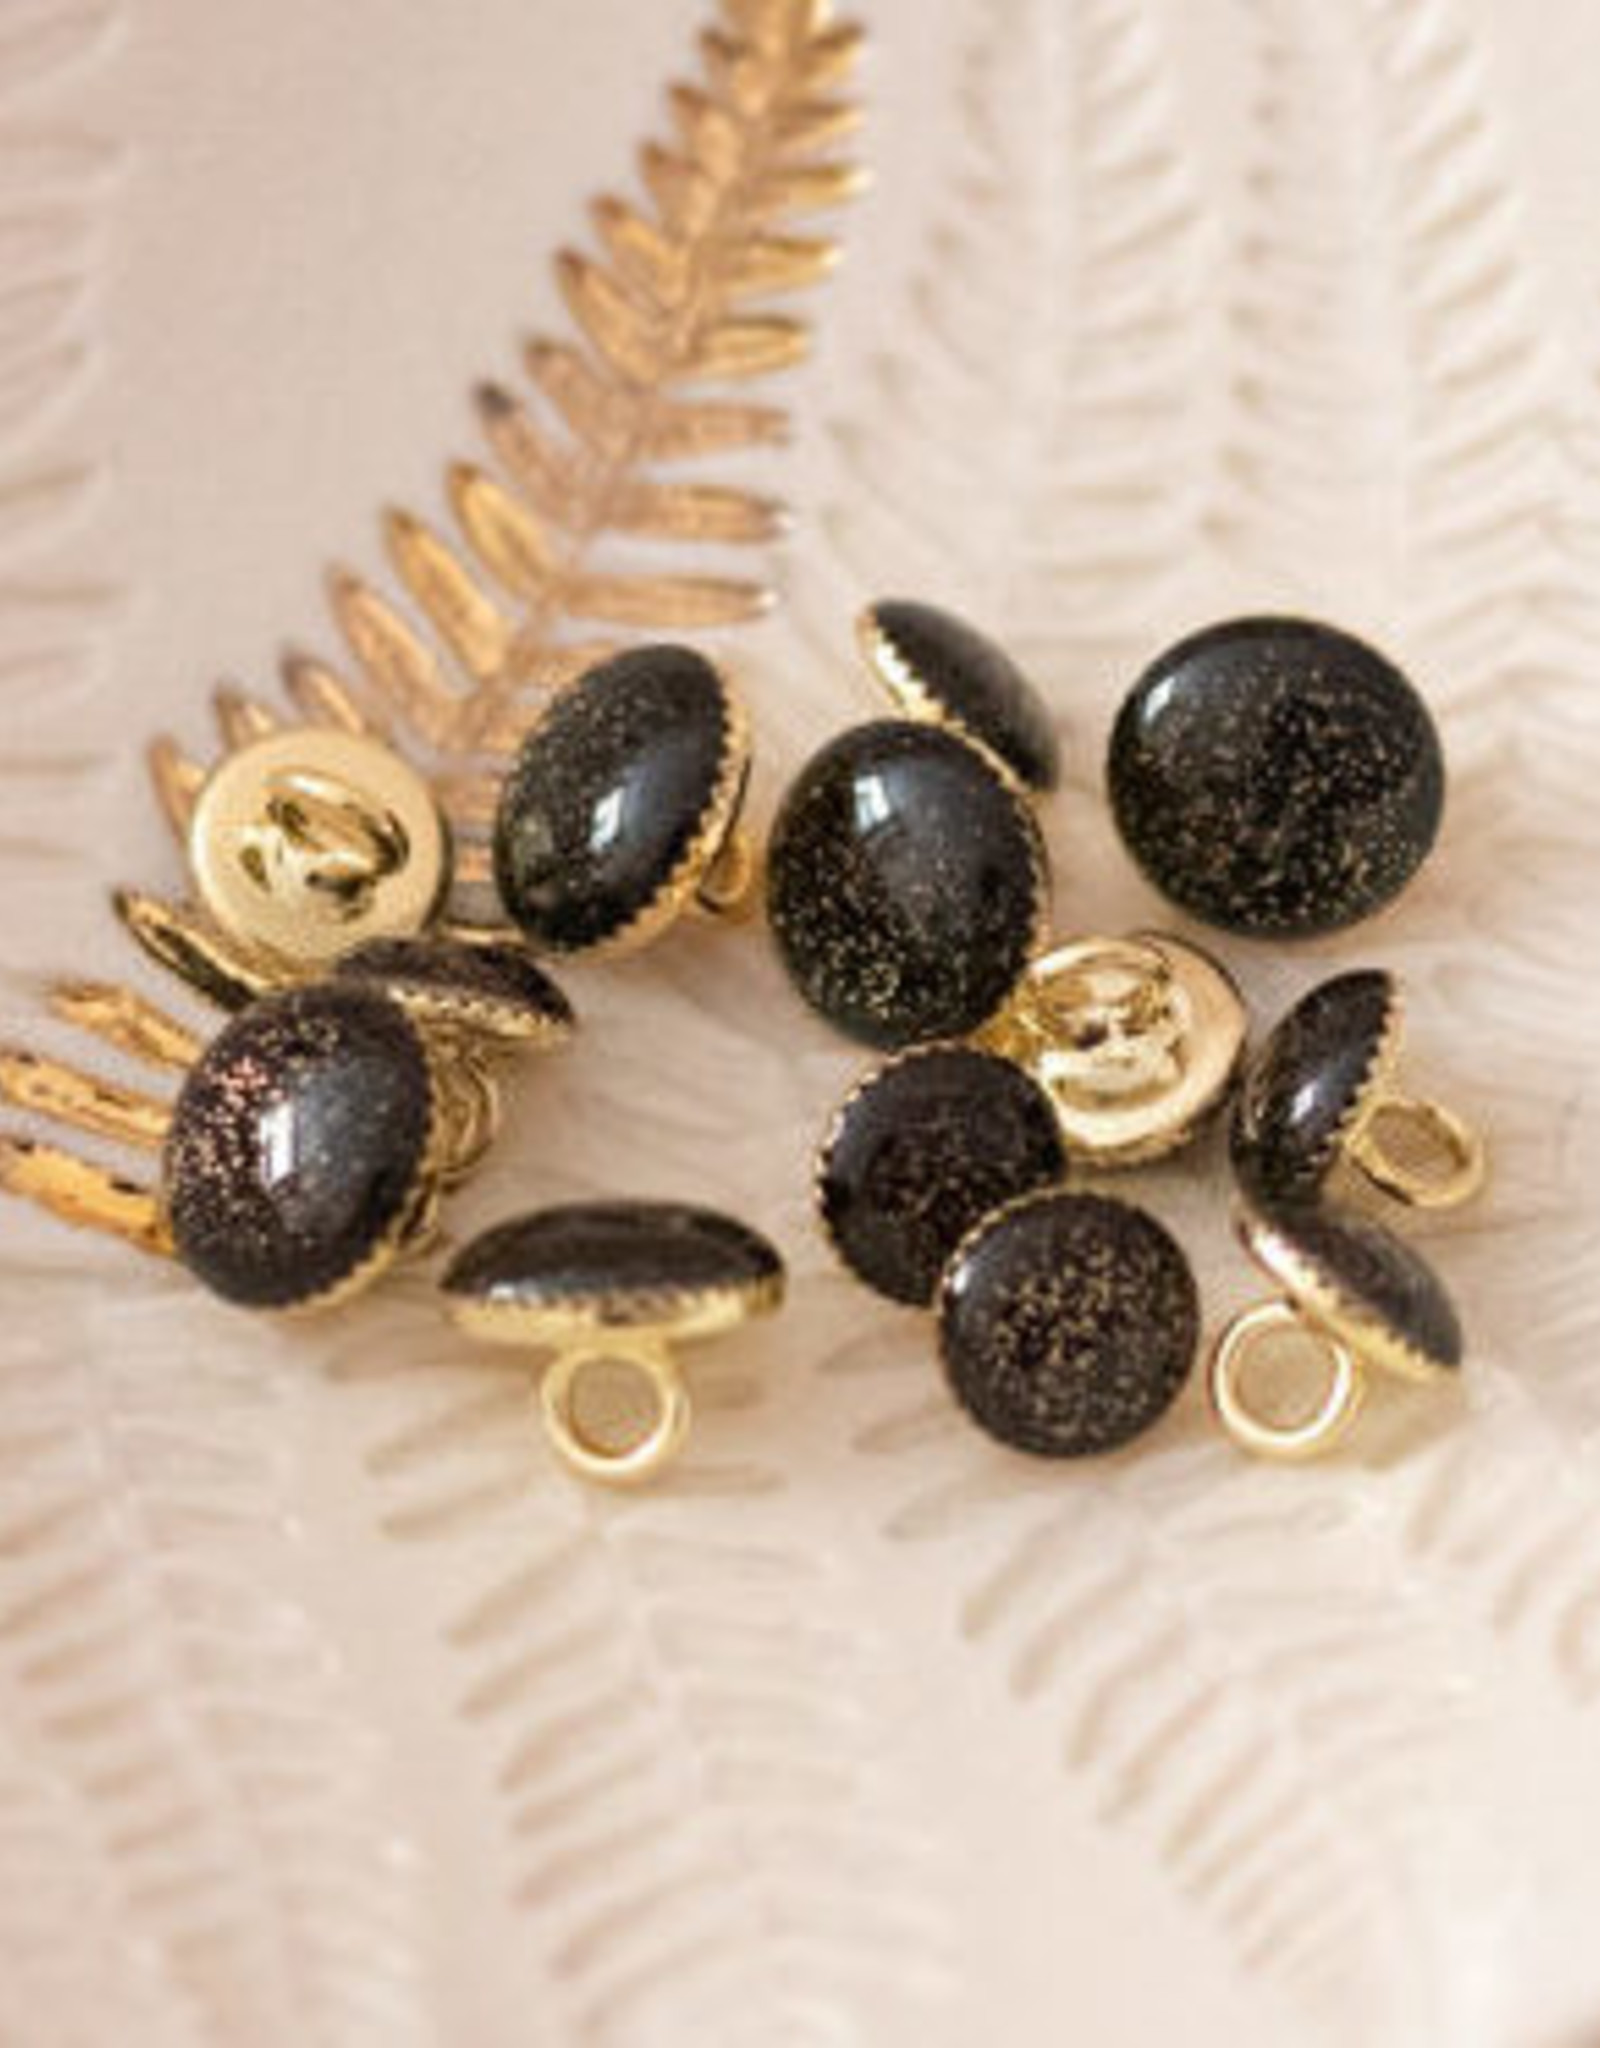 Lise Tailor Sierknoopje zwart glitter goud in gouden capsule 11mm